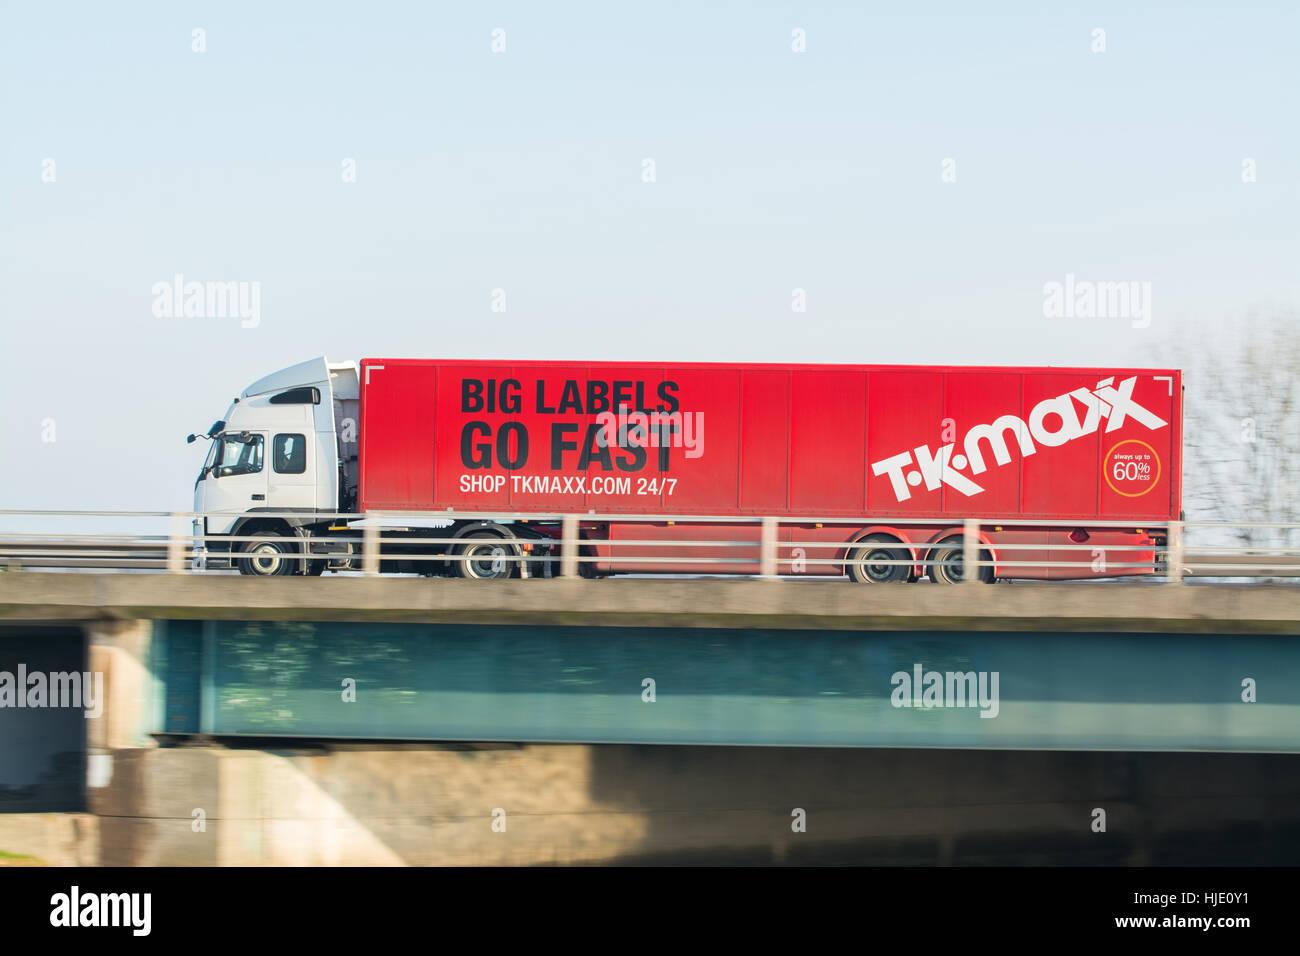 TK Maxx distribution lorry - Scotland, UK - Stock Image